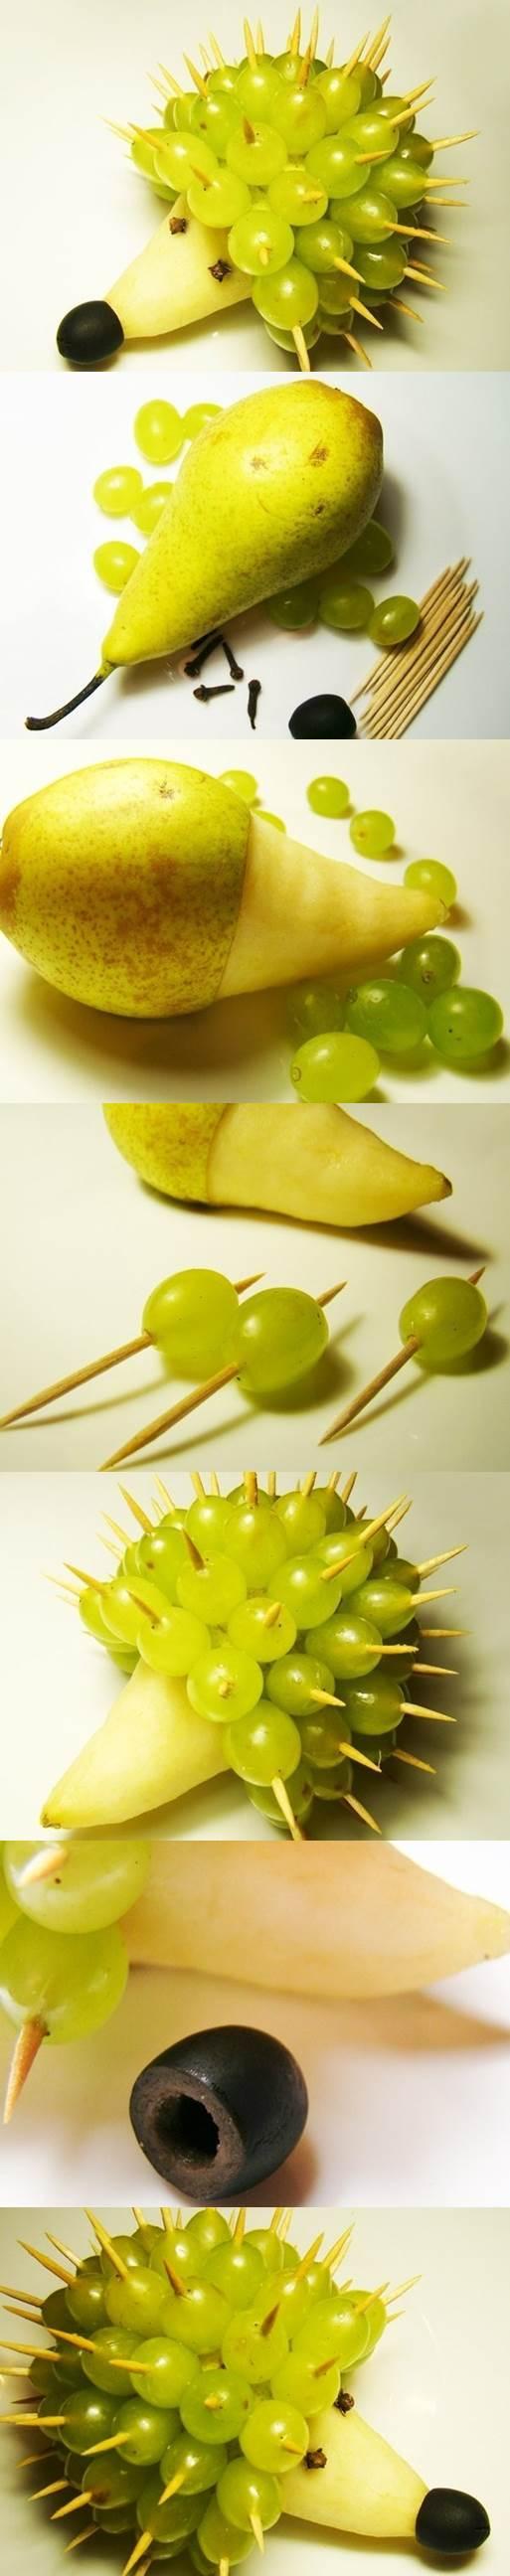 Food Art DIY - Hedgehog